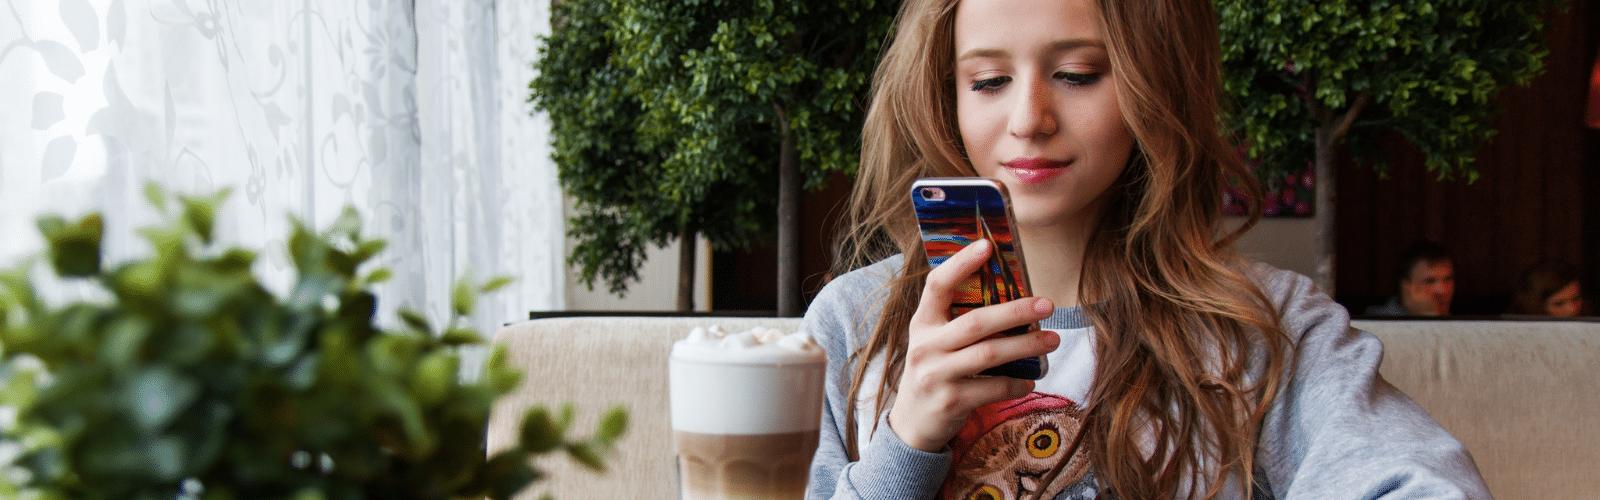 Xaalys : la néo banque qui accompagne les adolescents vers l'autonomie financière